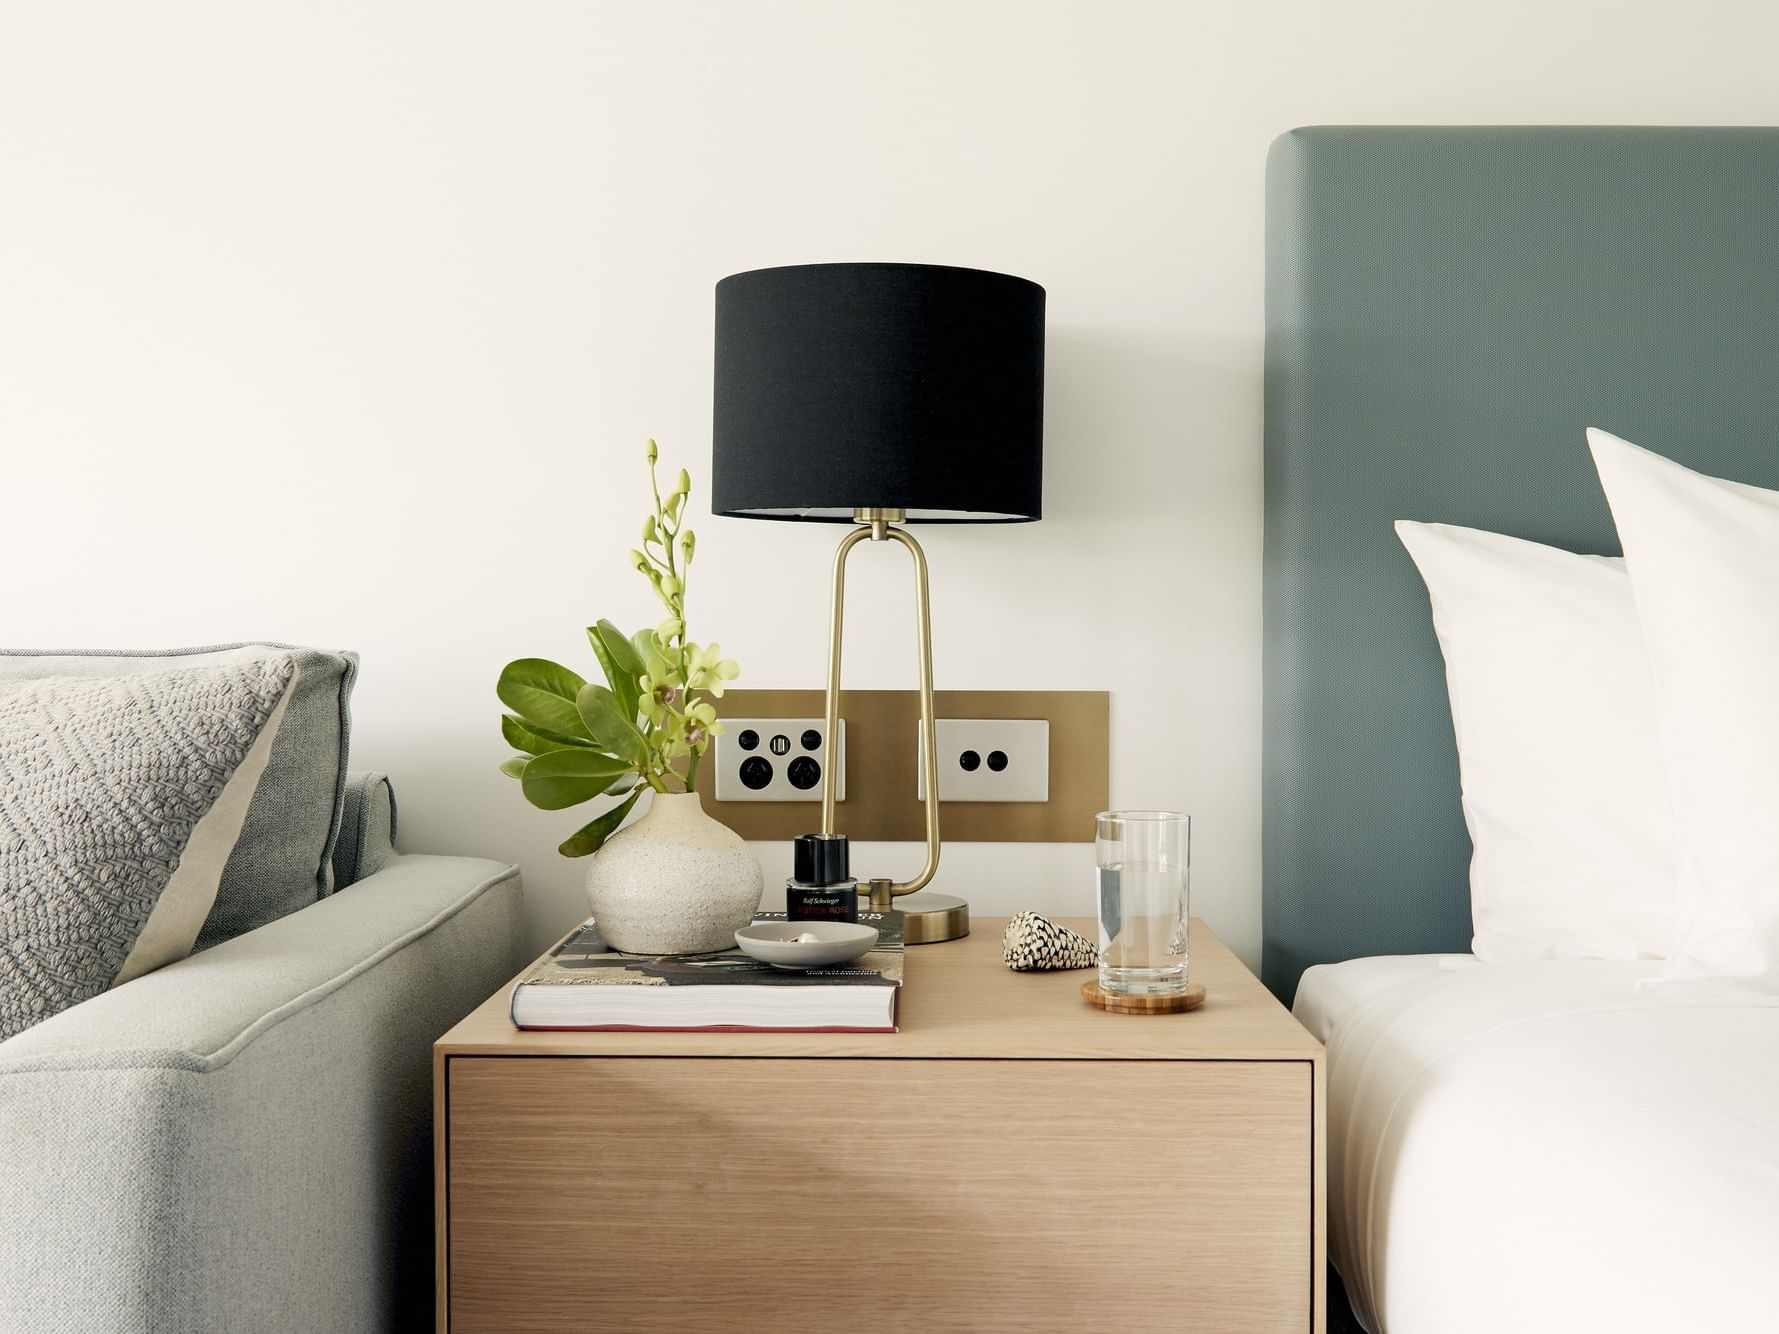 Lampshade in Resort Room at Daydream Island Resort